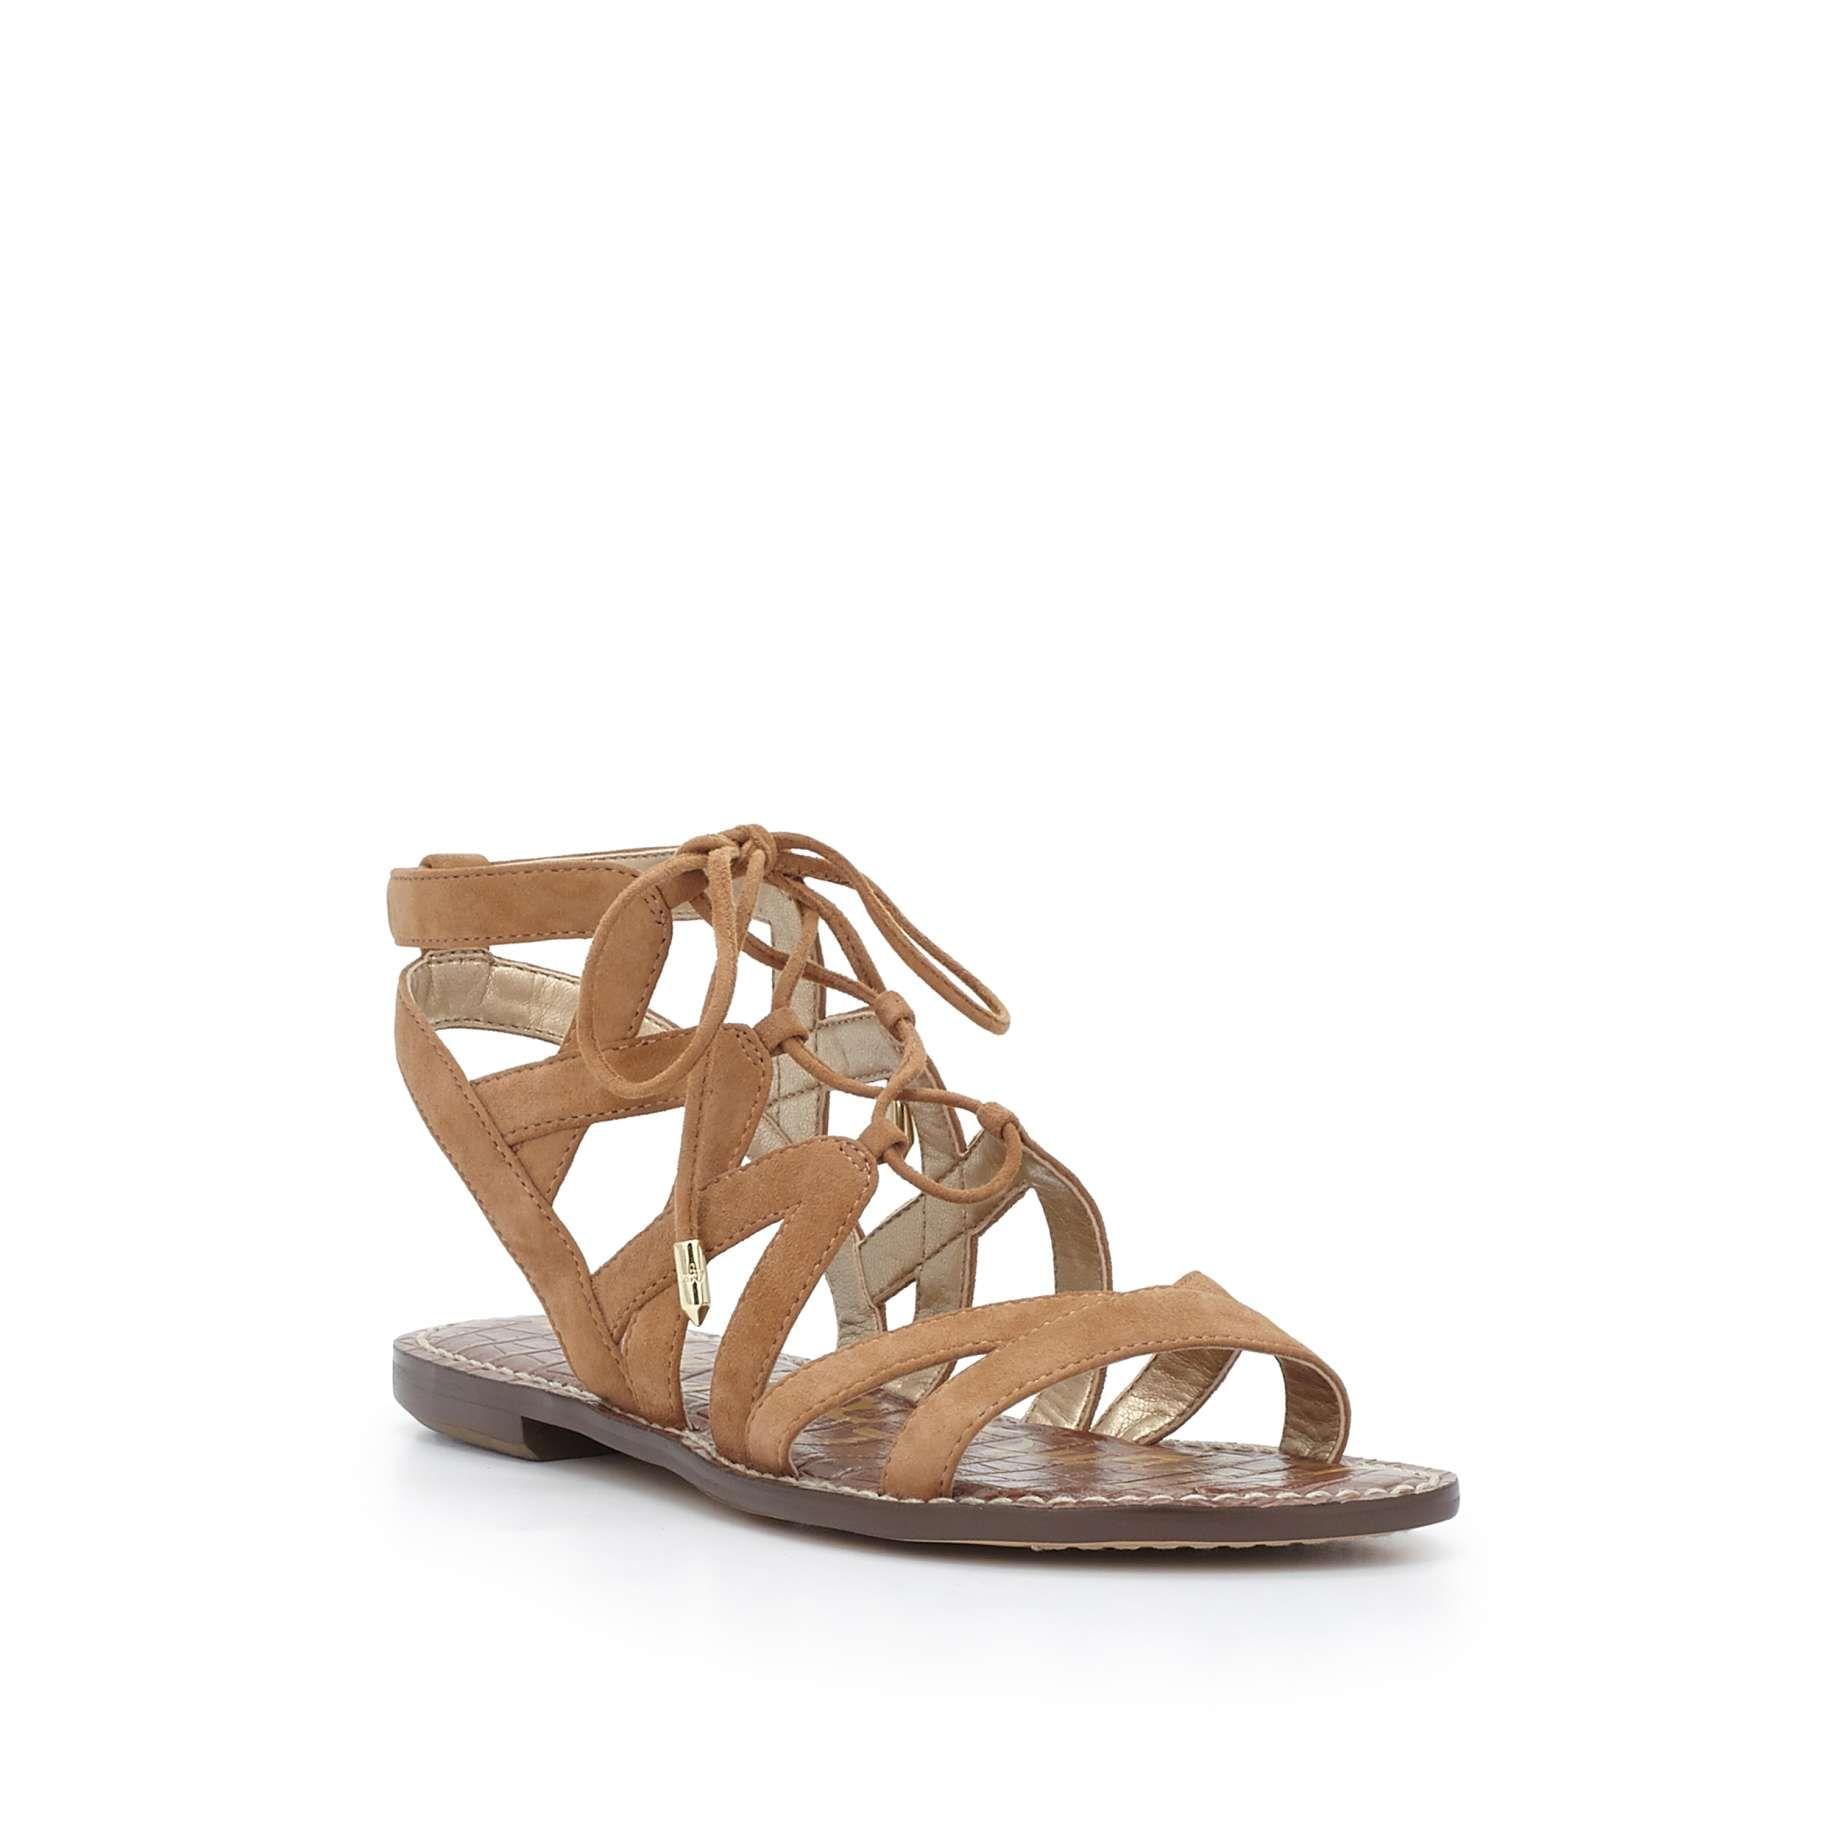 278c91a54 Gemma Lace-Up Gladiator Sandal by Sam Edelman - Golden Caramel - View 3